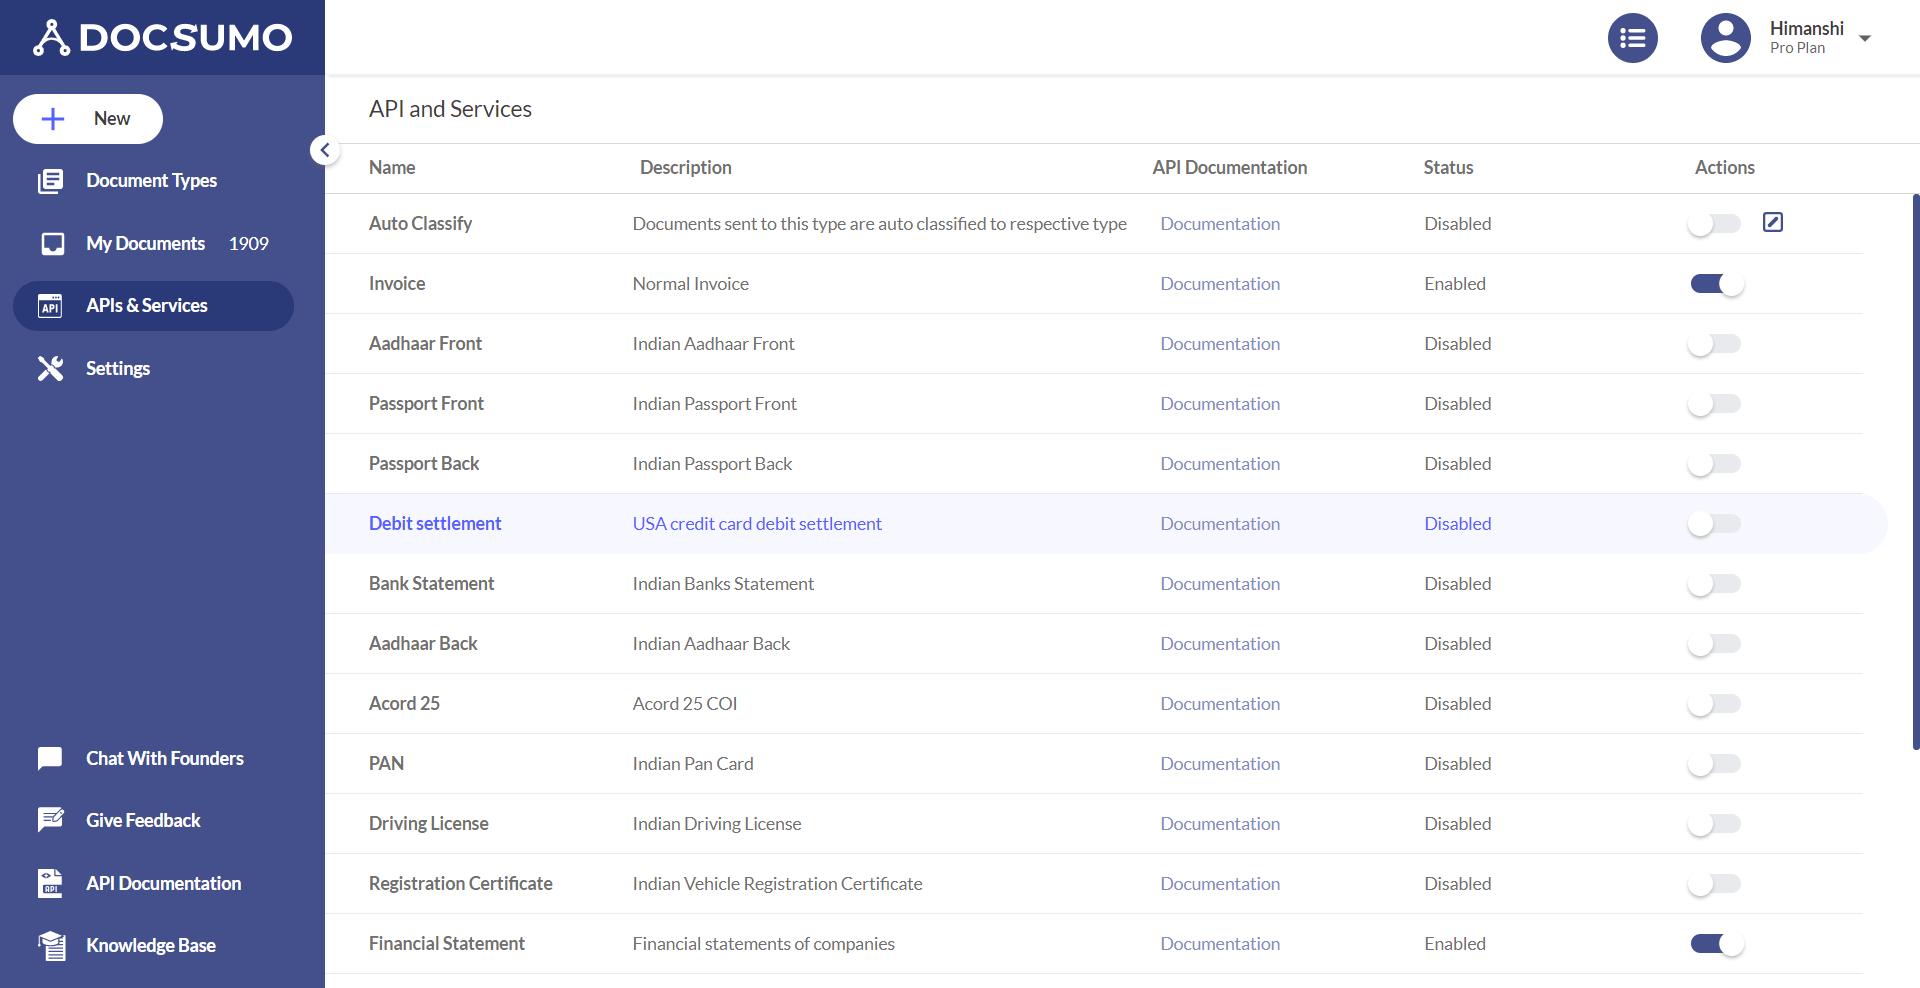 Docsumo API screenshot